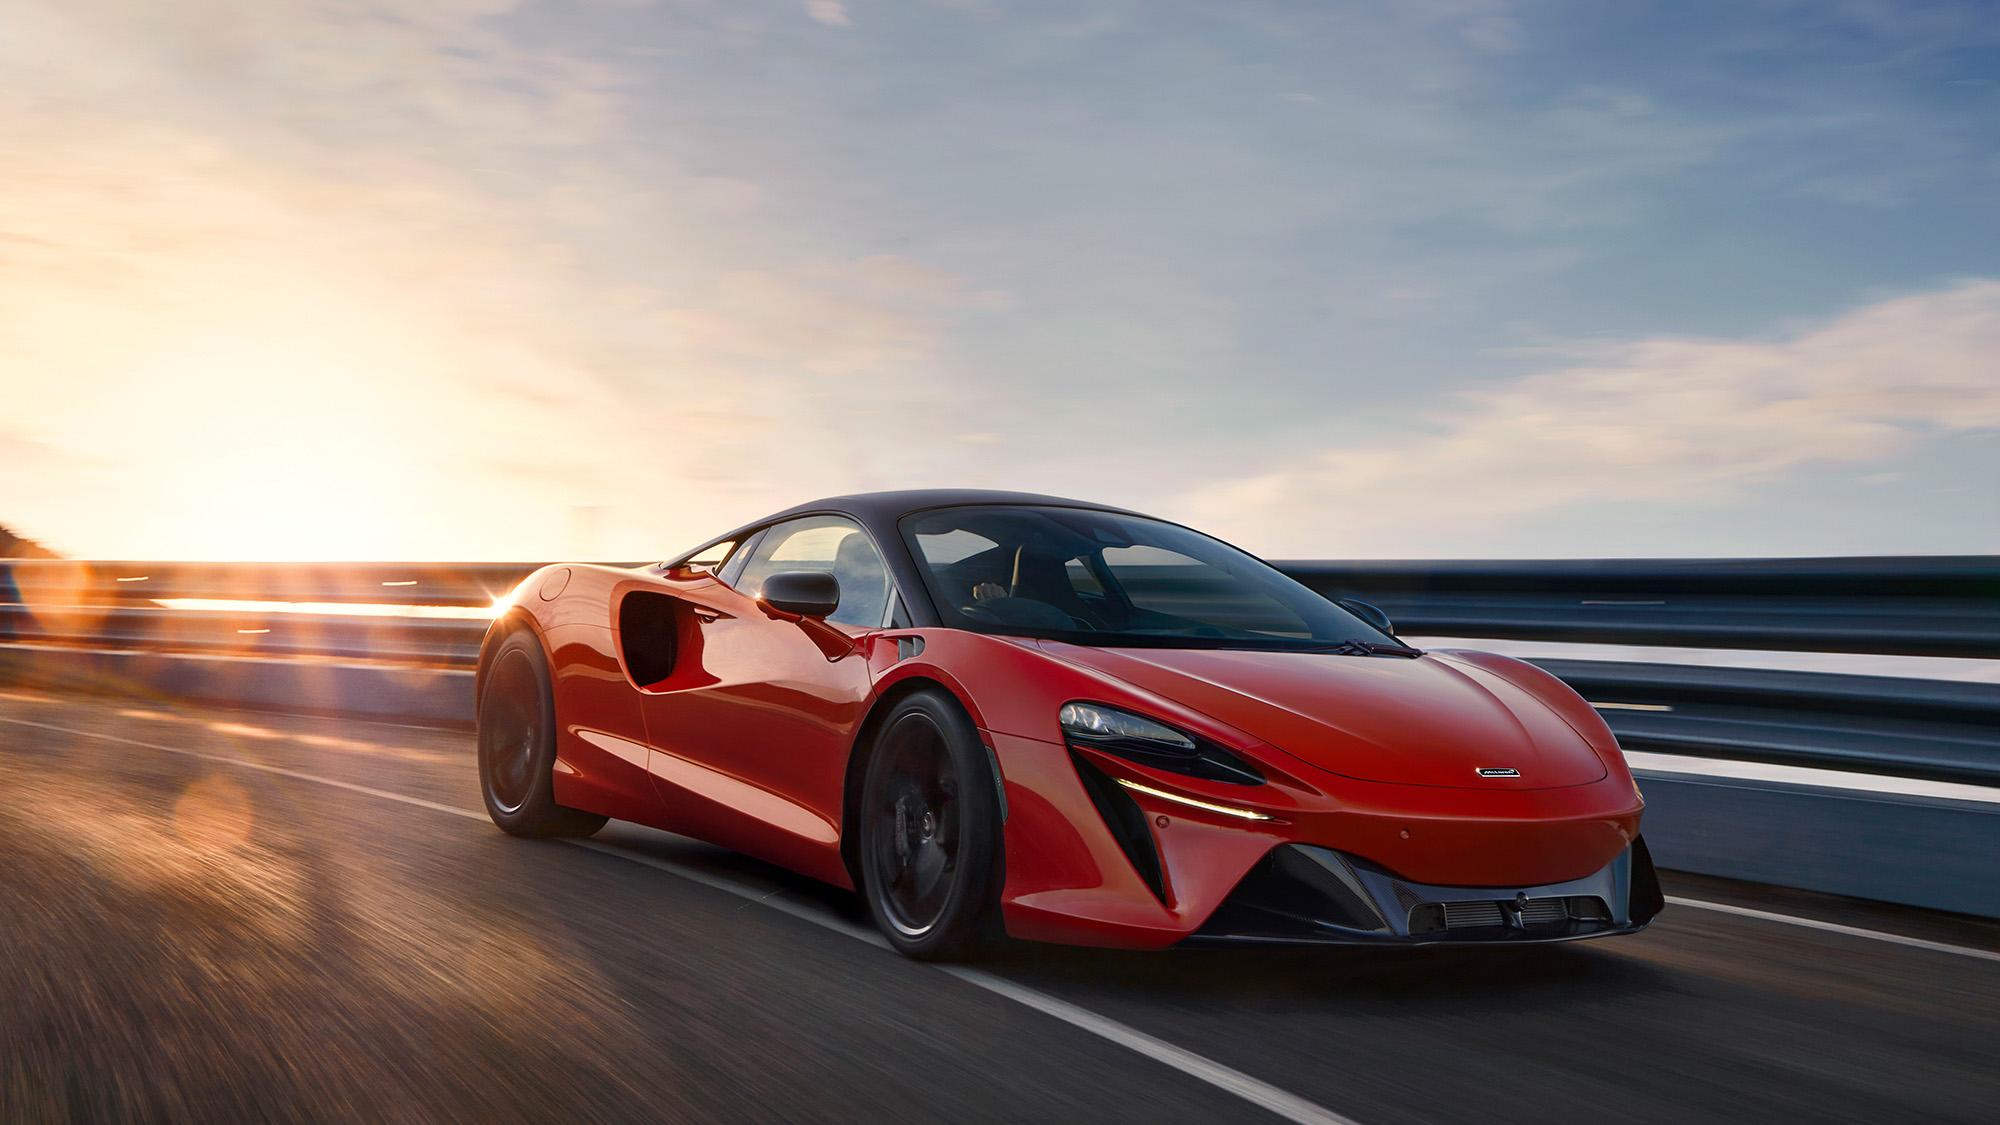 2021 McLaren Artura front tq